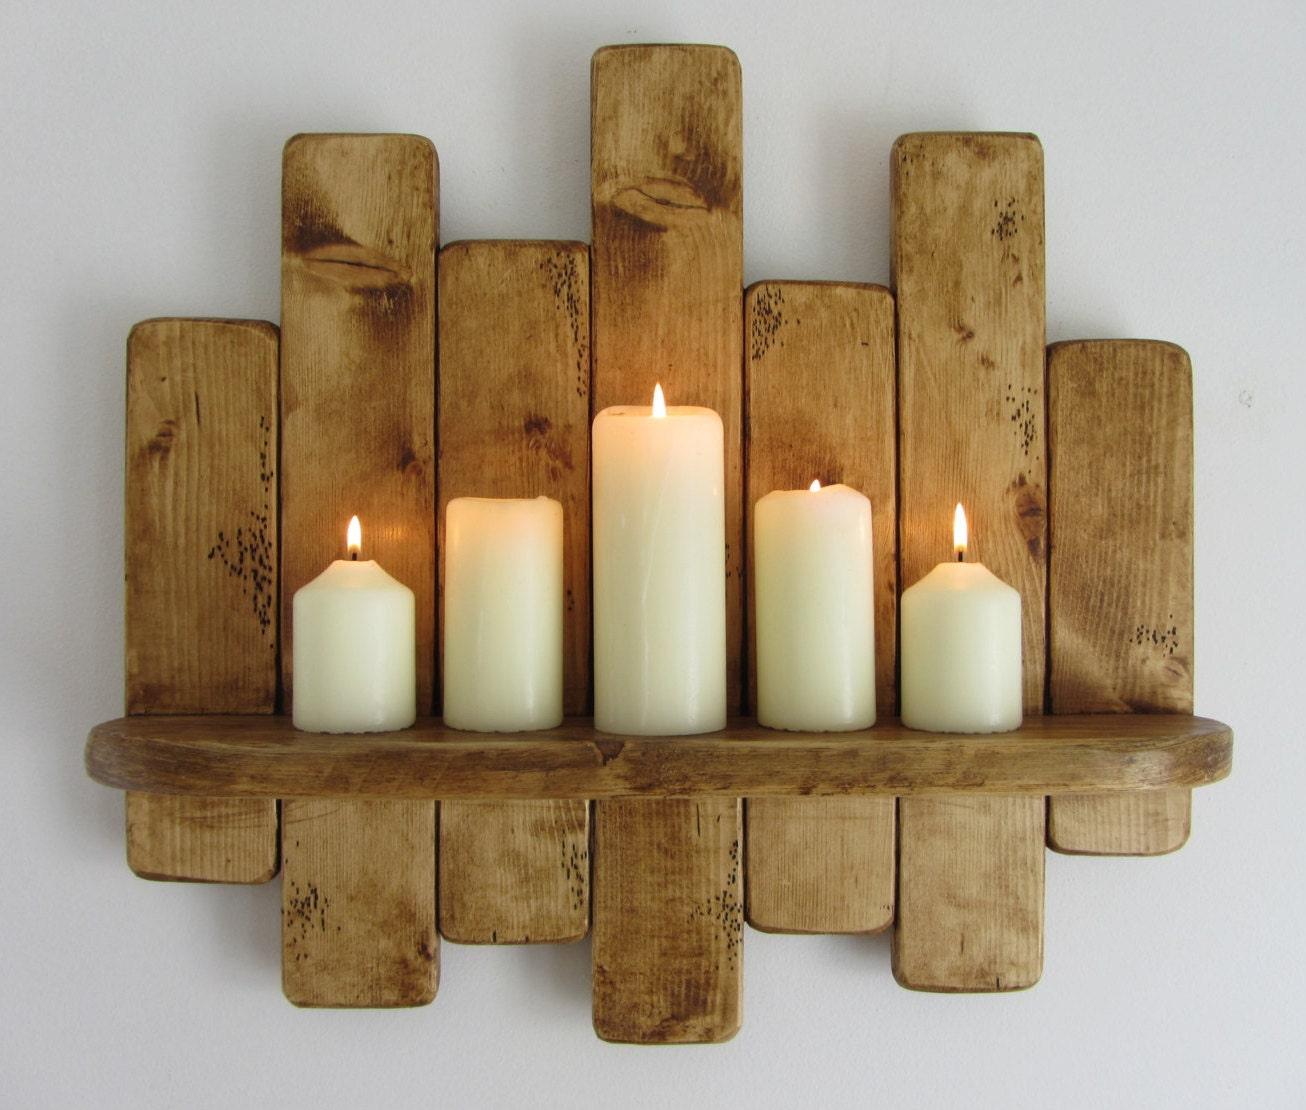 Pallet Wood Shelf: 50 Cm Rustic Reclaimed Pallet Wood Floating Shelf Kitchen